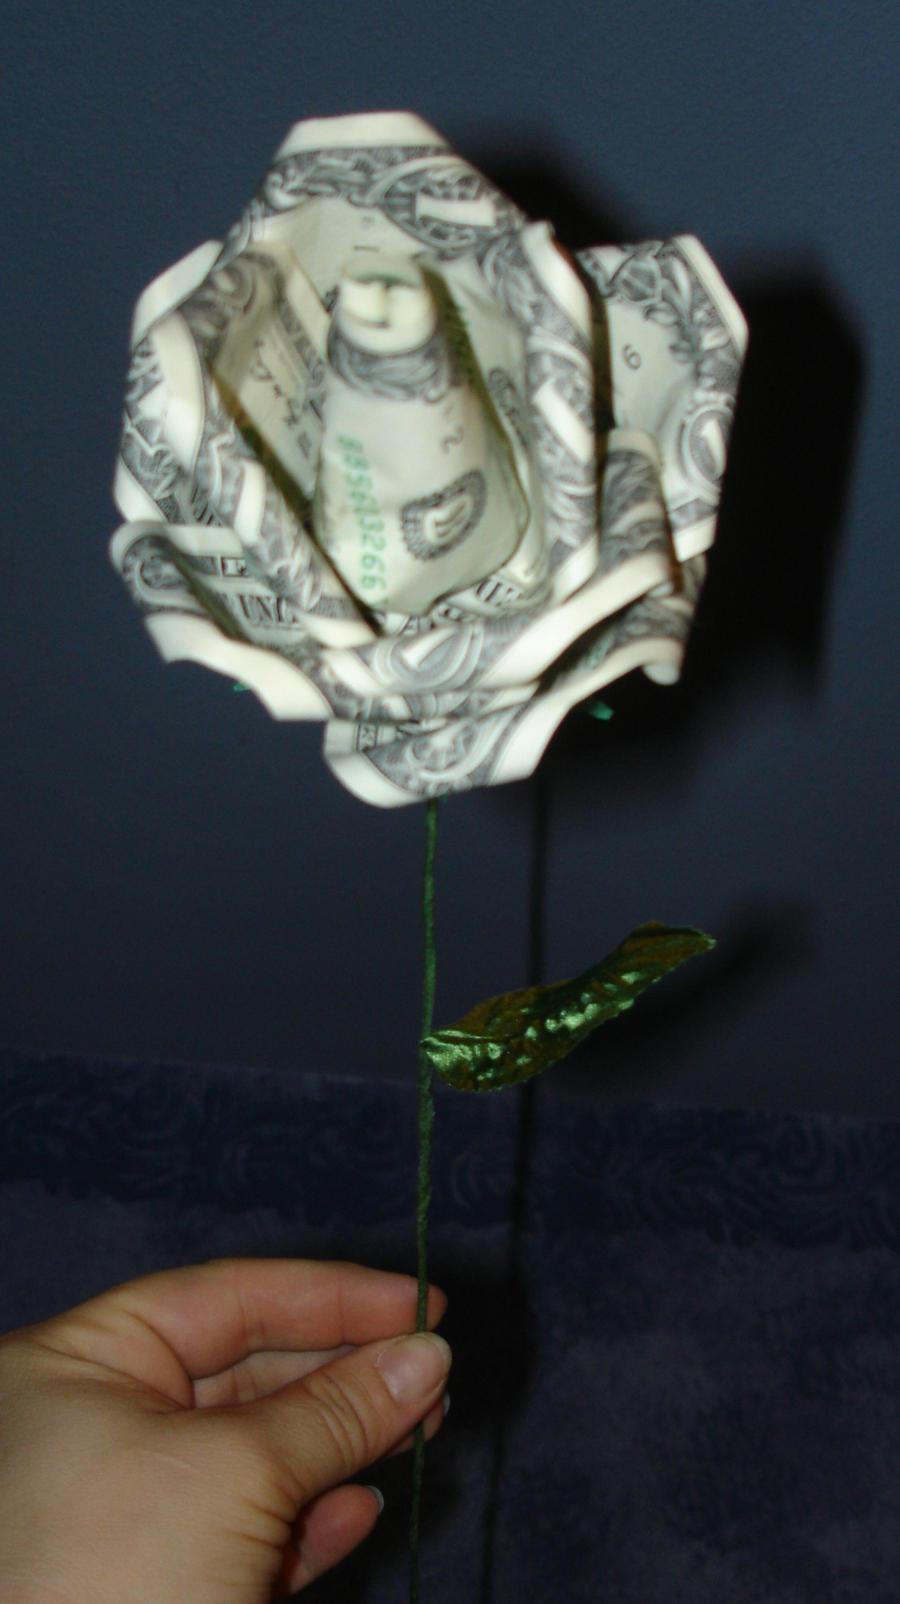 origami money rose by pandaraoke on DeviantArt - photo#15